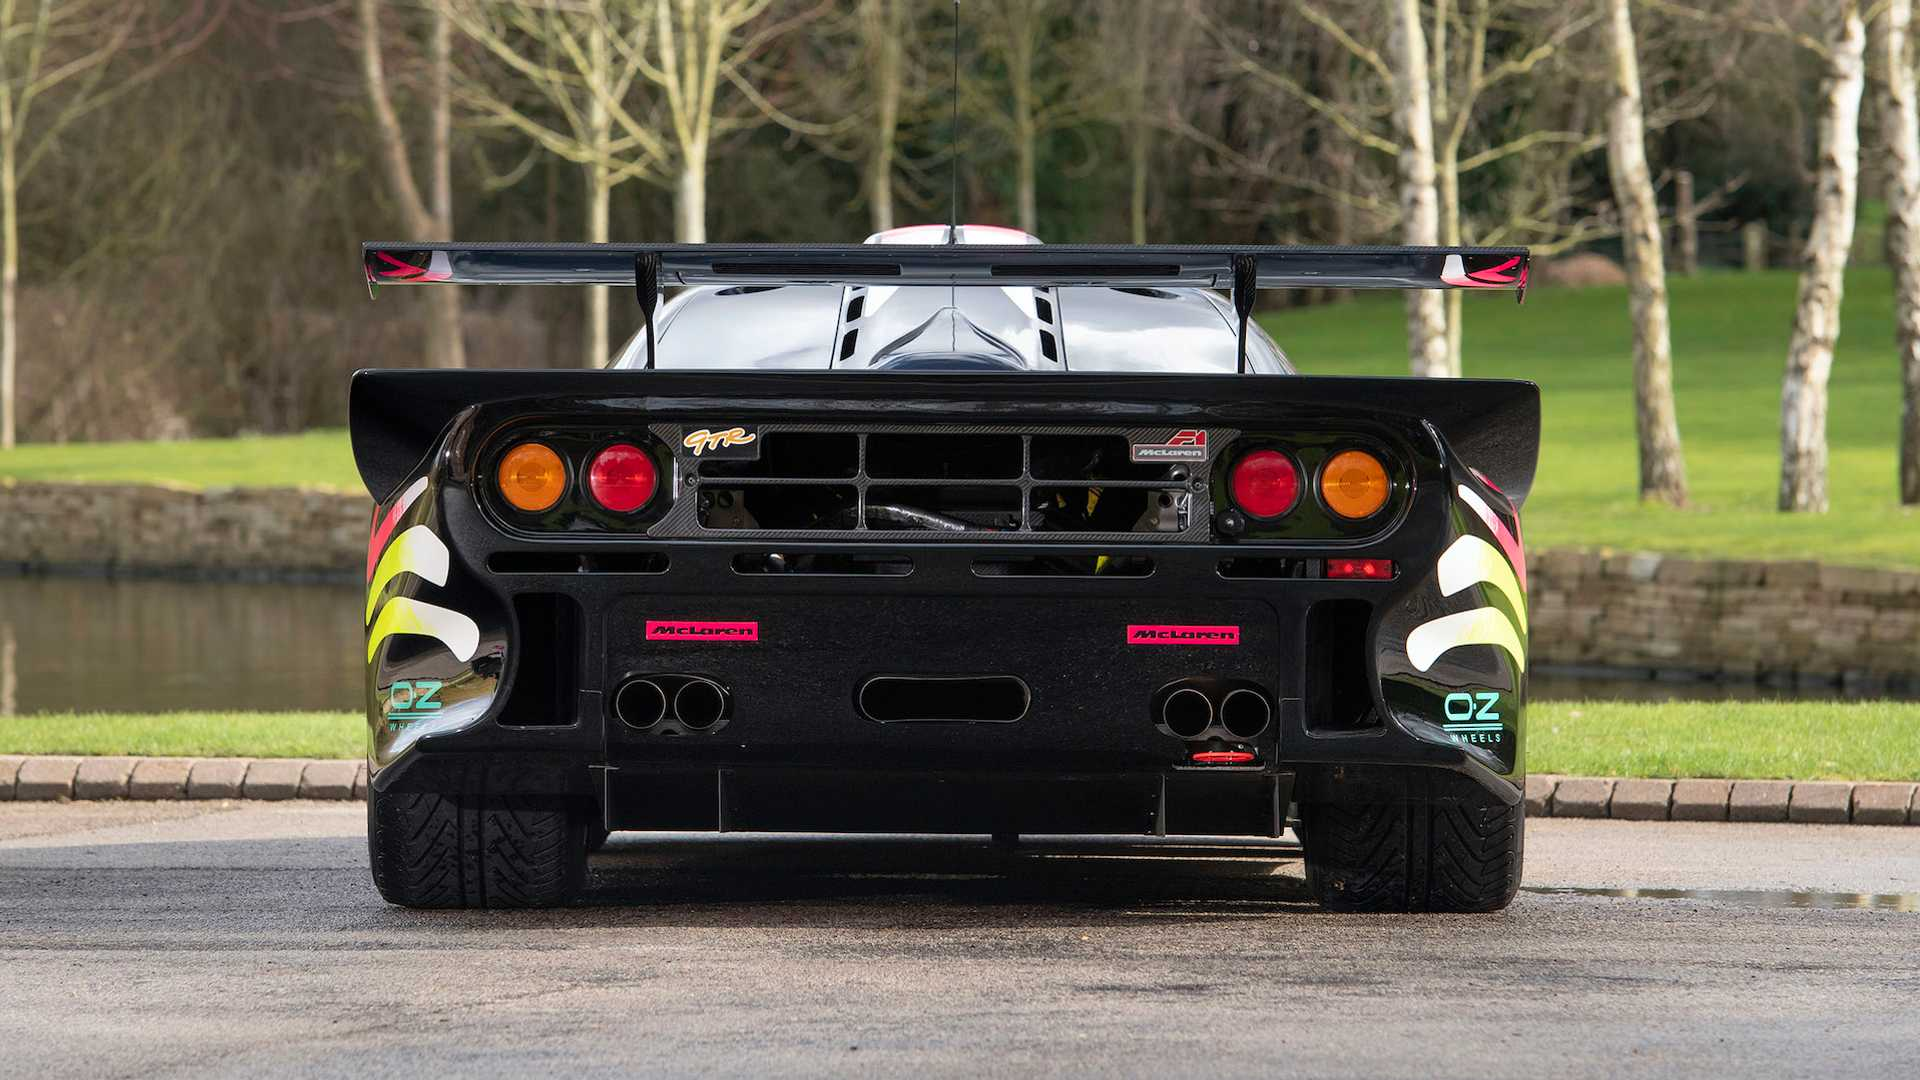 McLaren F1 GTR Longtail Rear